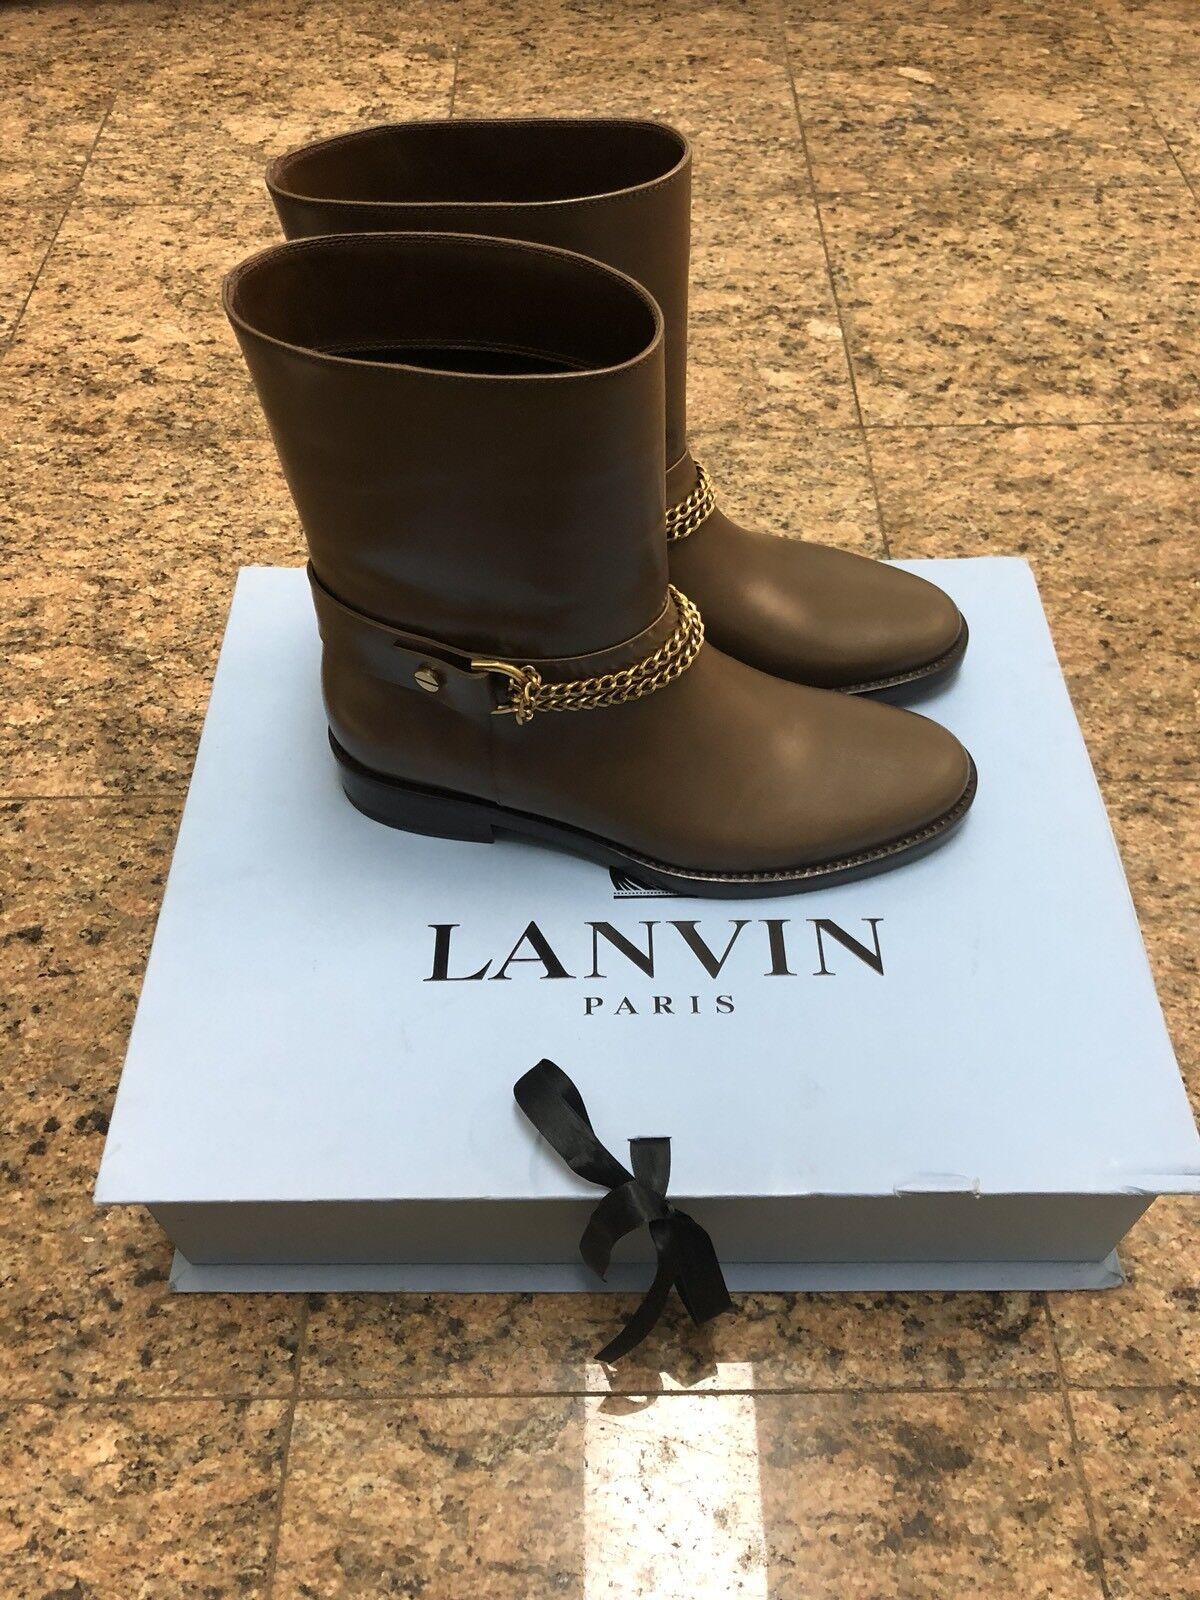 Lanvin Leather Chain Boots NIB